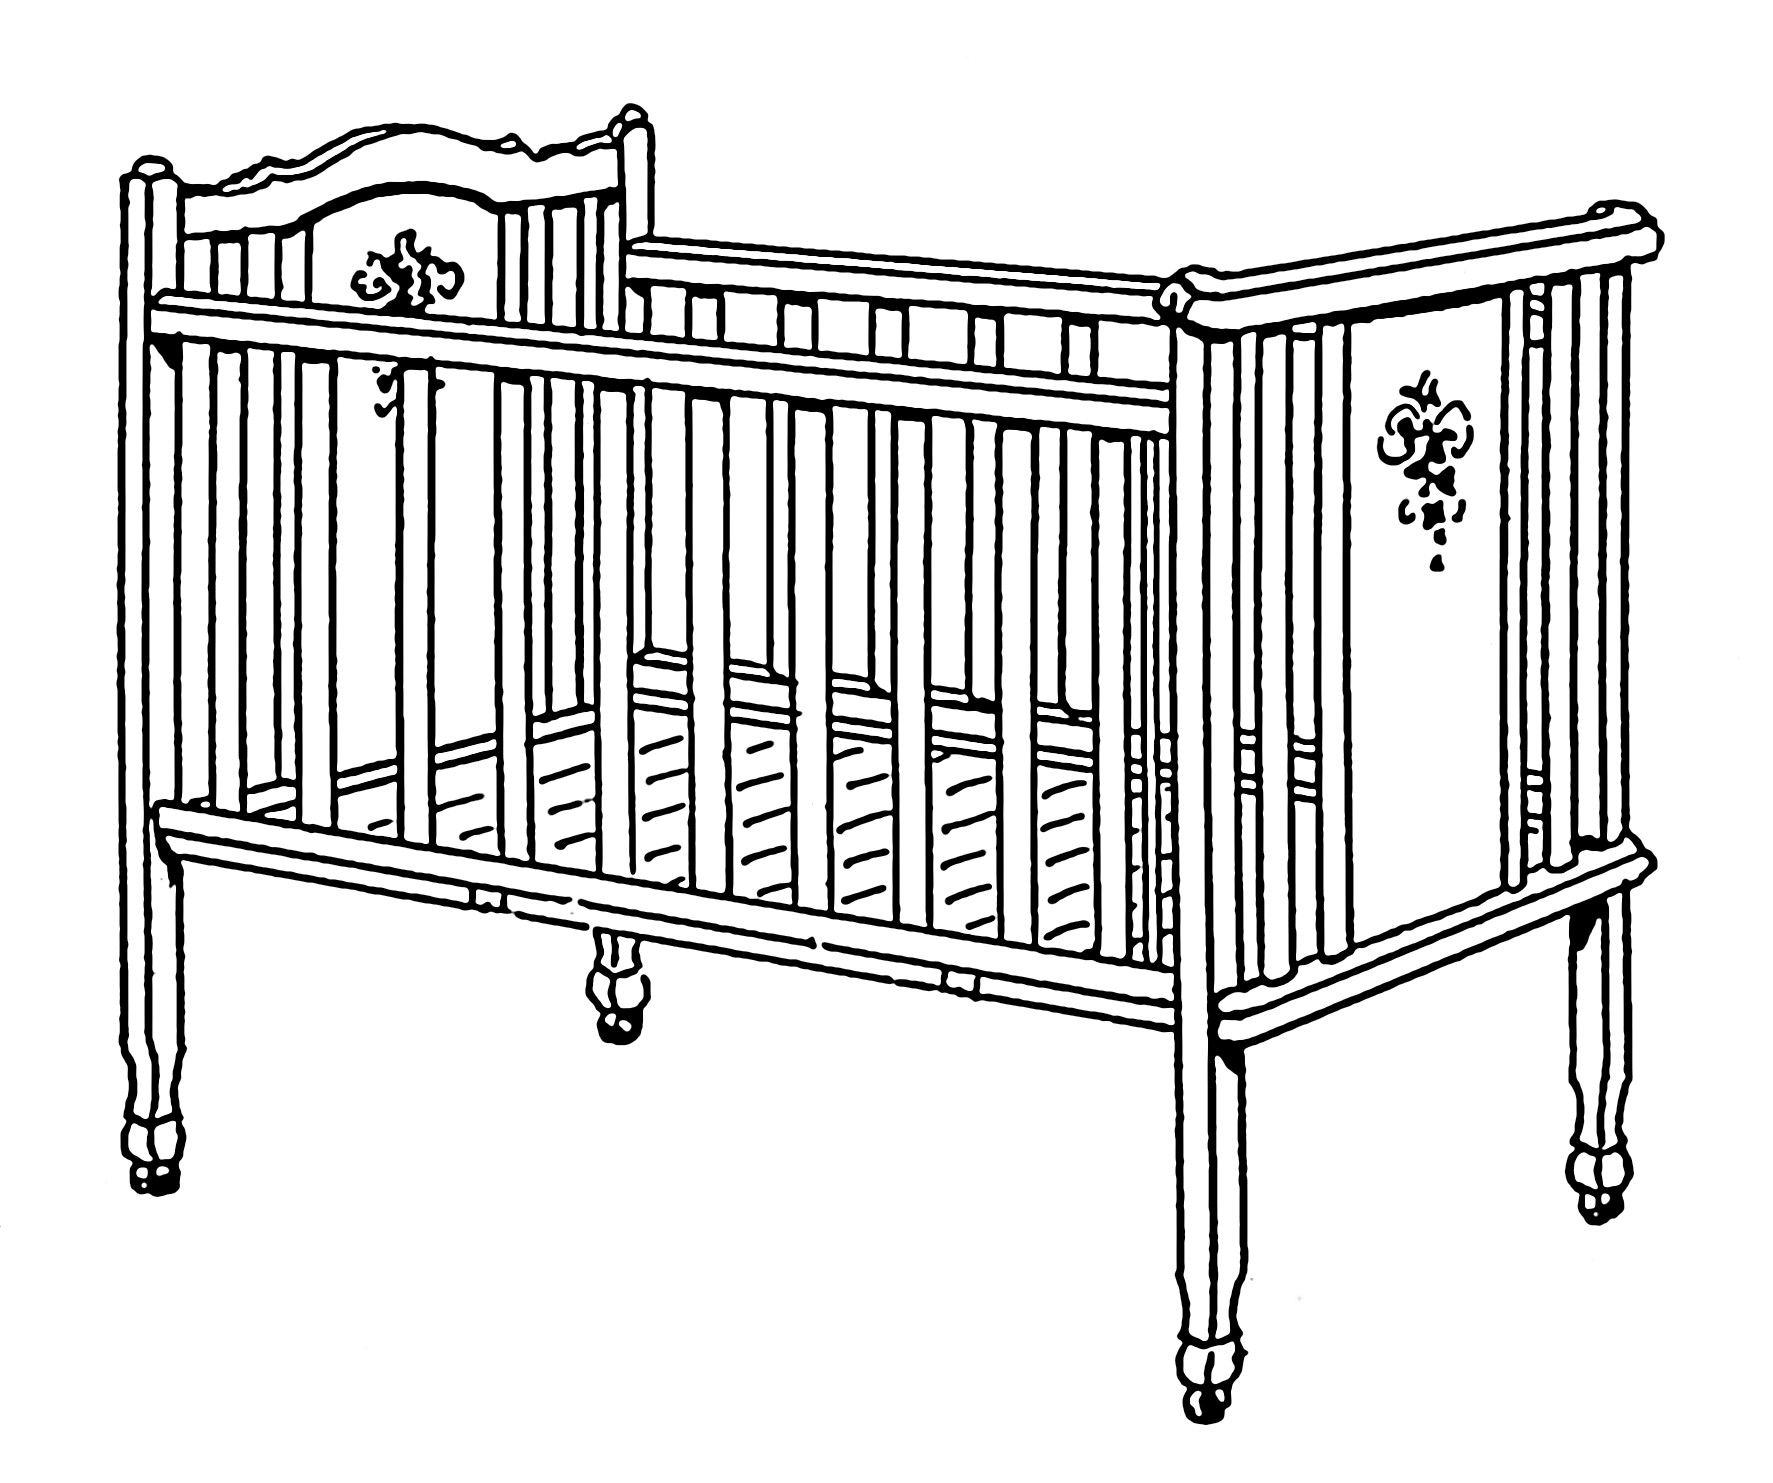 Baby bed fall prevention - Baby Bed Fall Prevention 19